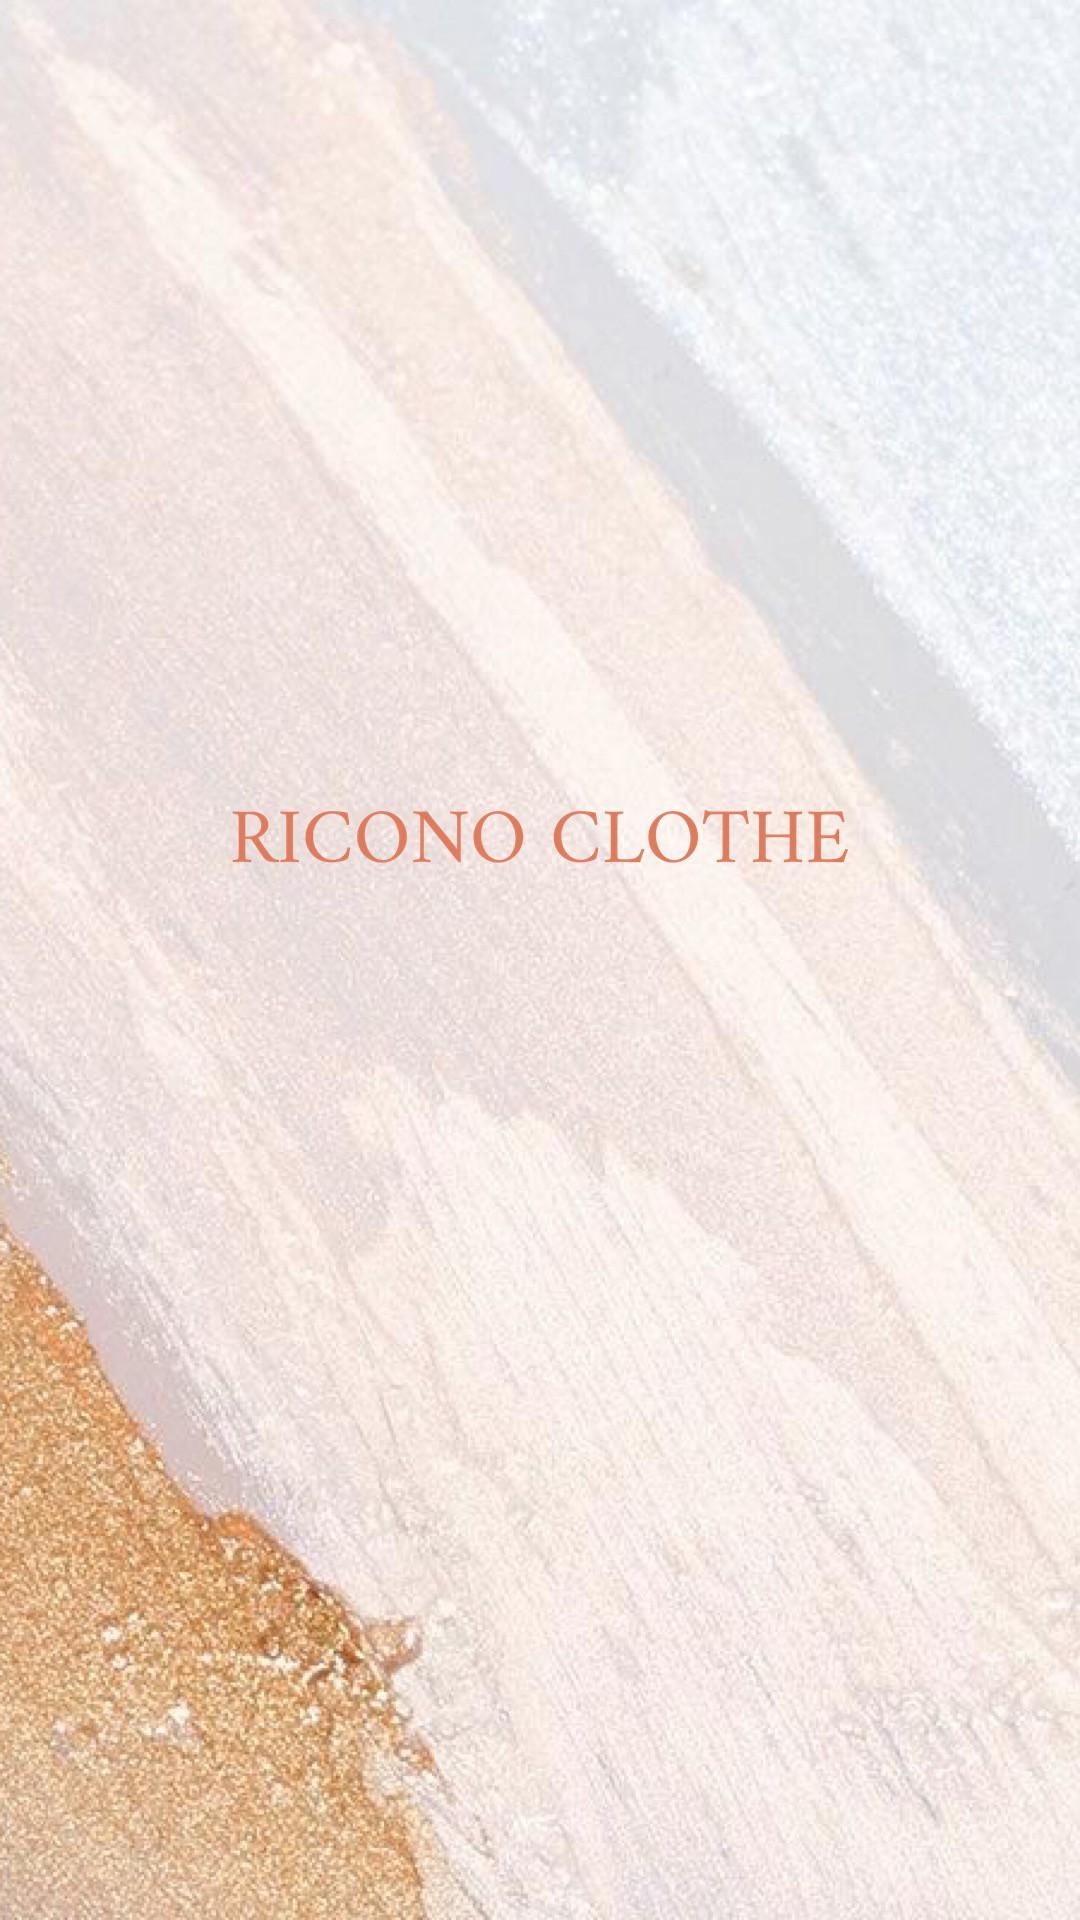 RICONO CLOTHE (リコノクローシェ)